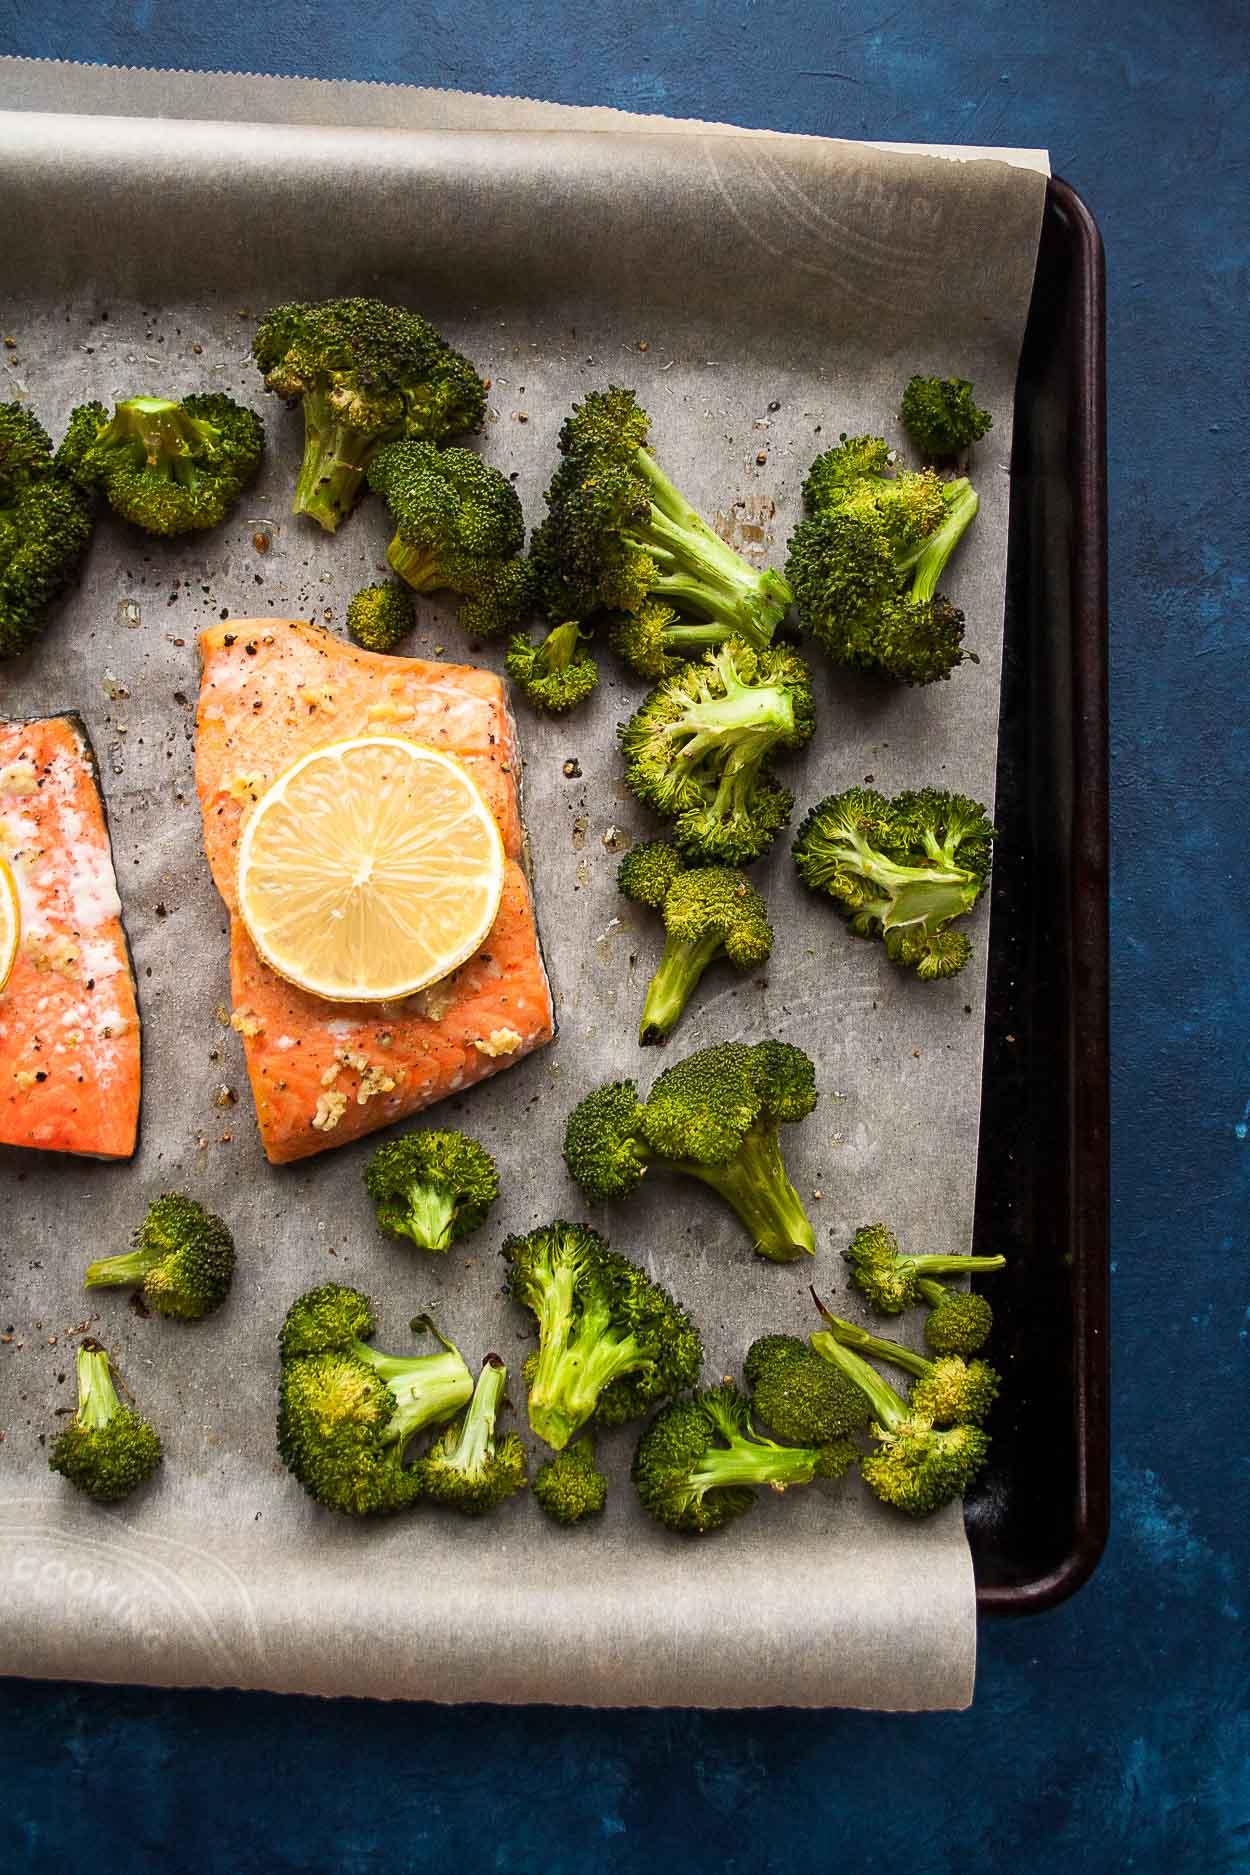 Sheet Pan Salmon with Roasted Broccoli